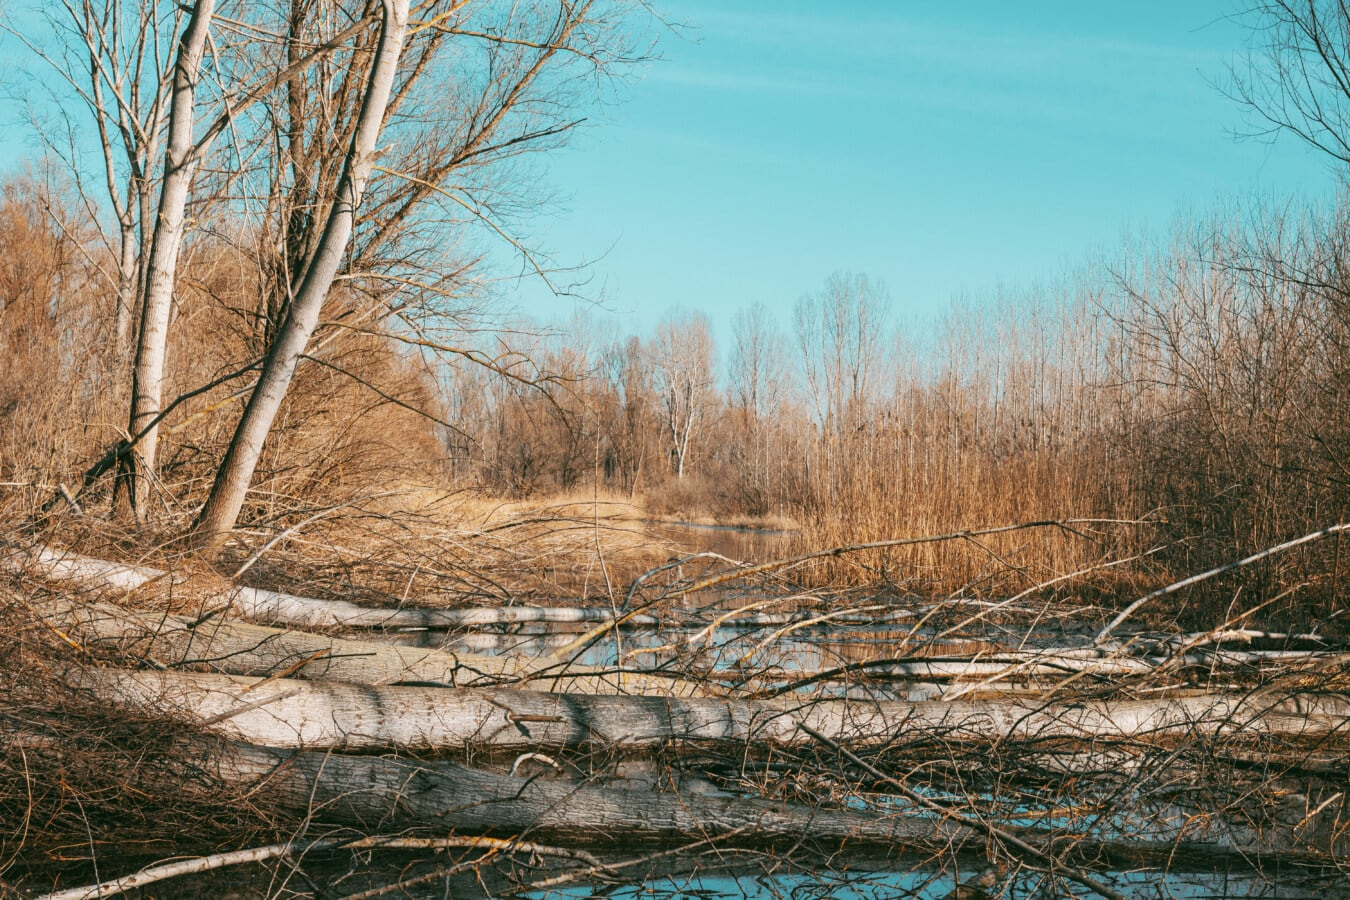 poplar, wetland, swamp, marshland, autumn season, forest, branches, trees, land, water